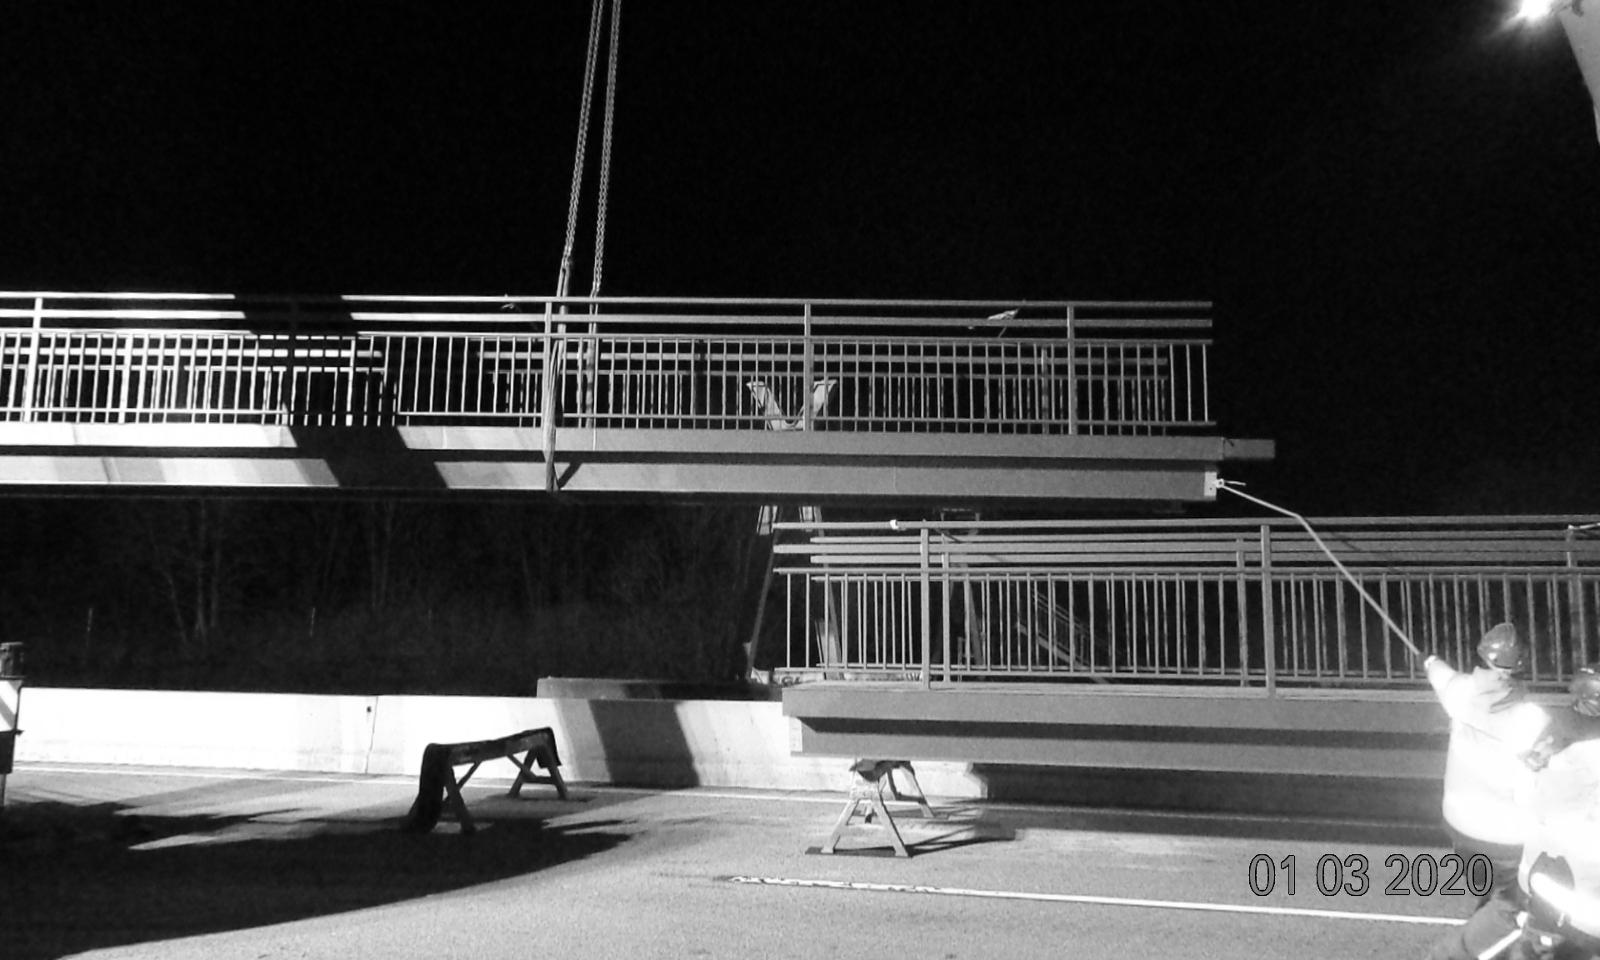 Montage - A 5 Instandsetzung ÜF Gehwegbrücke bei Ockstadt und ÜF Gehwegbrücke bei Ober-Rosbach